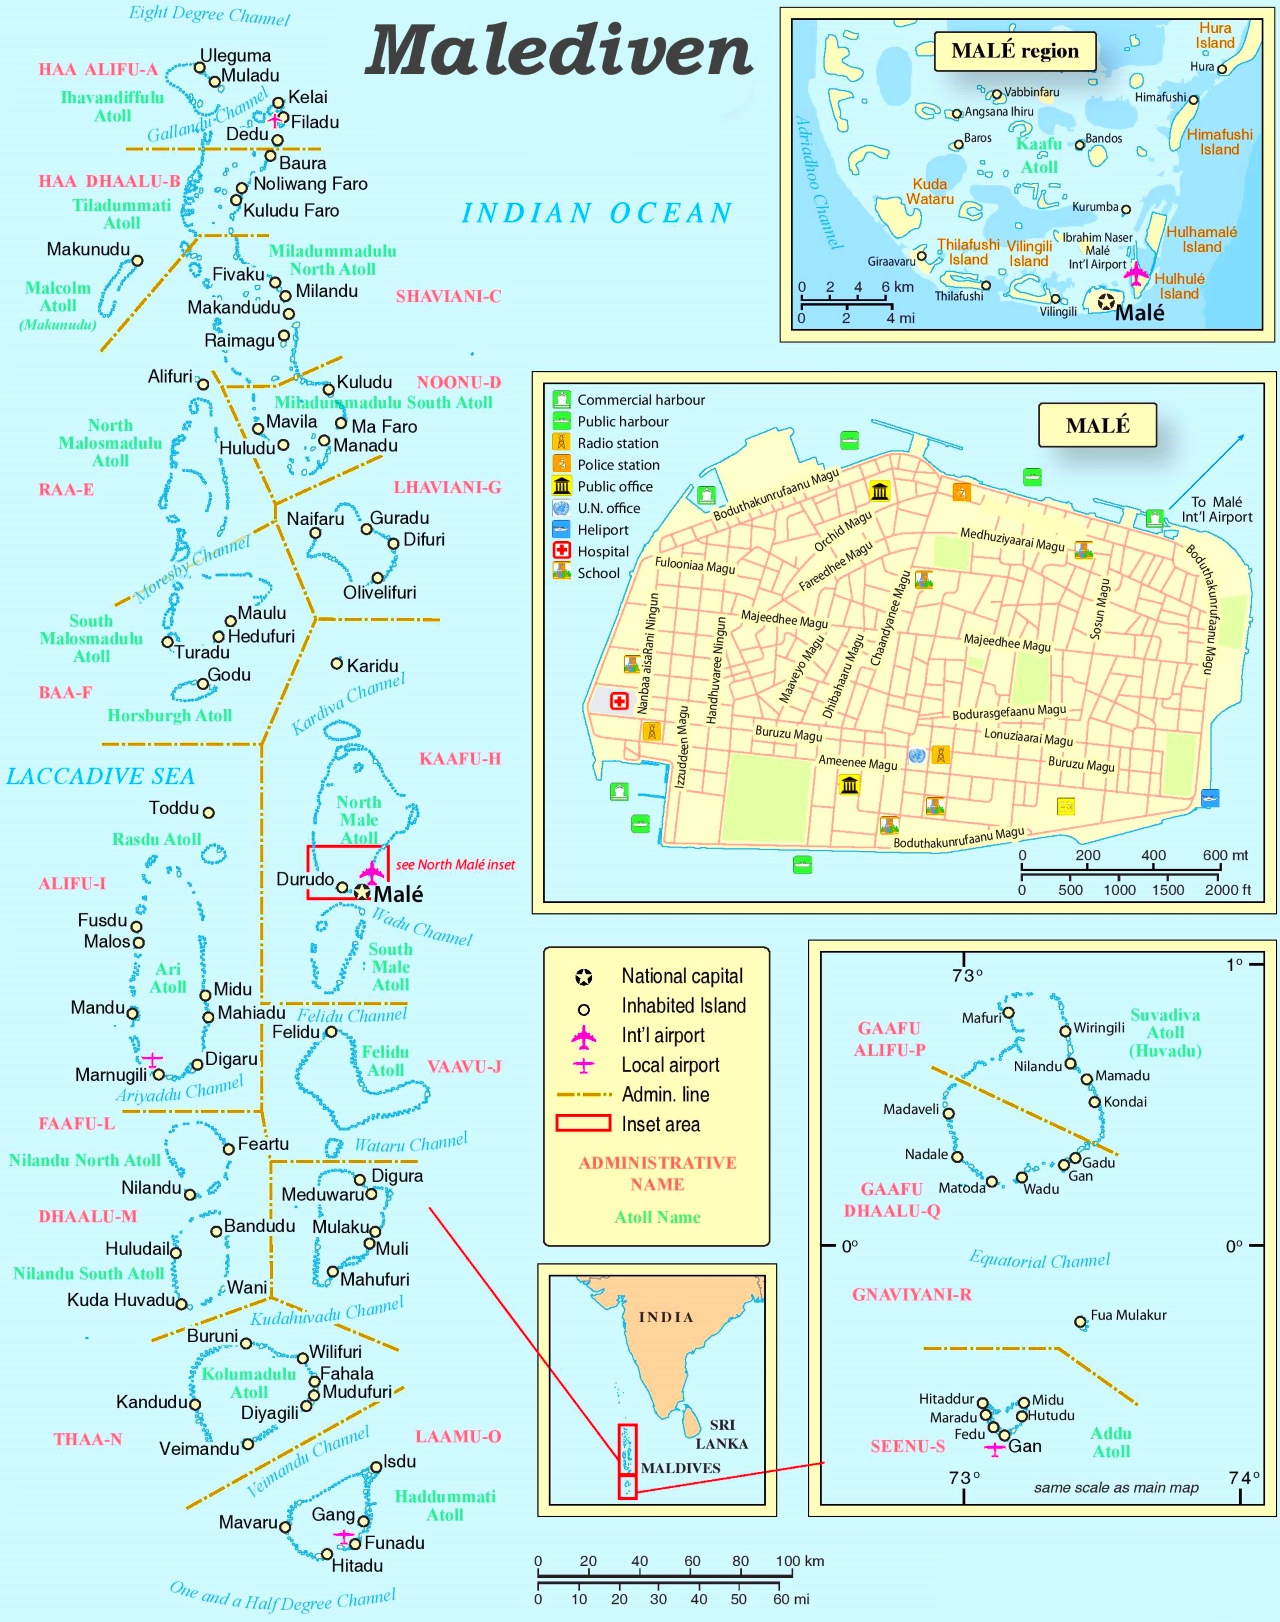 Malediven Politische Karte